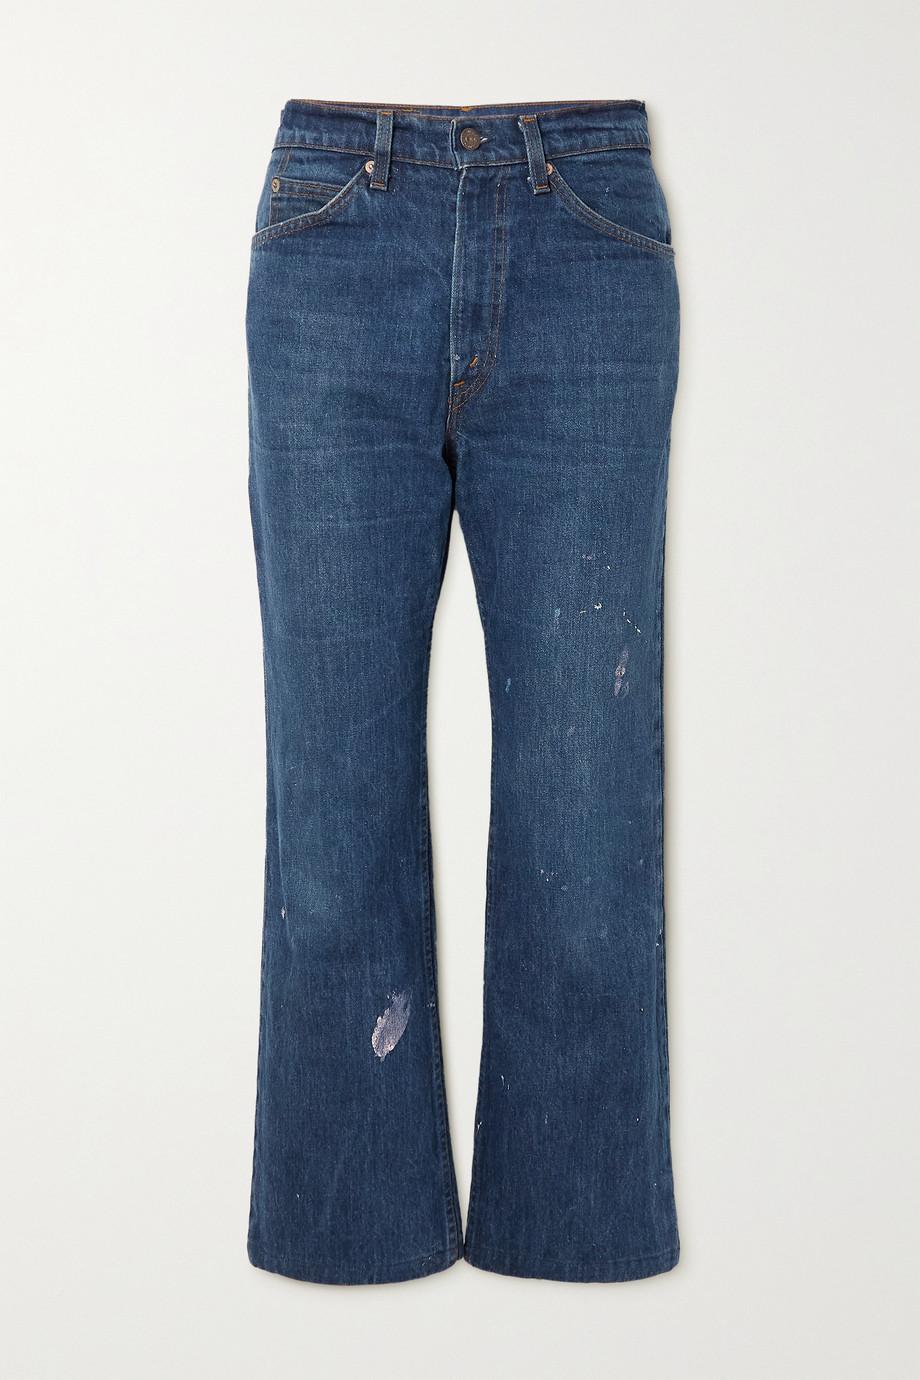 Valentino + Levi's® 1969 517 halbhohe Bootcut-Jeans mit Print